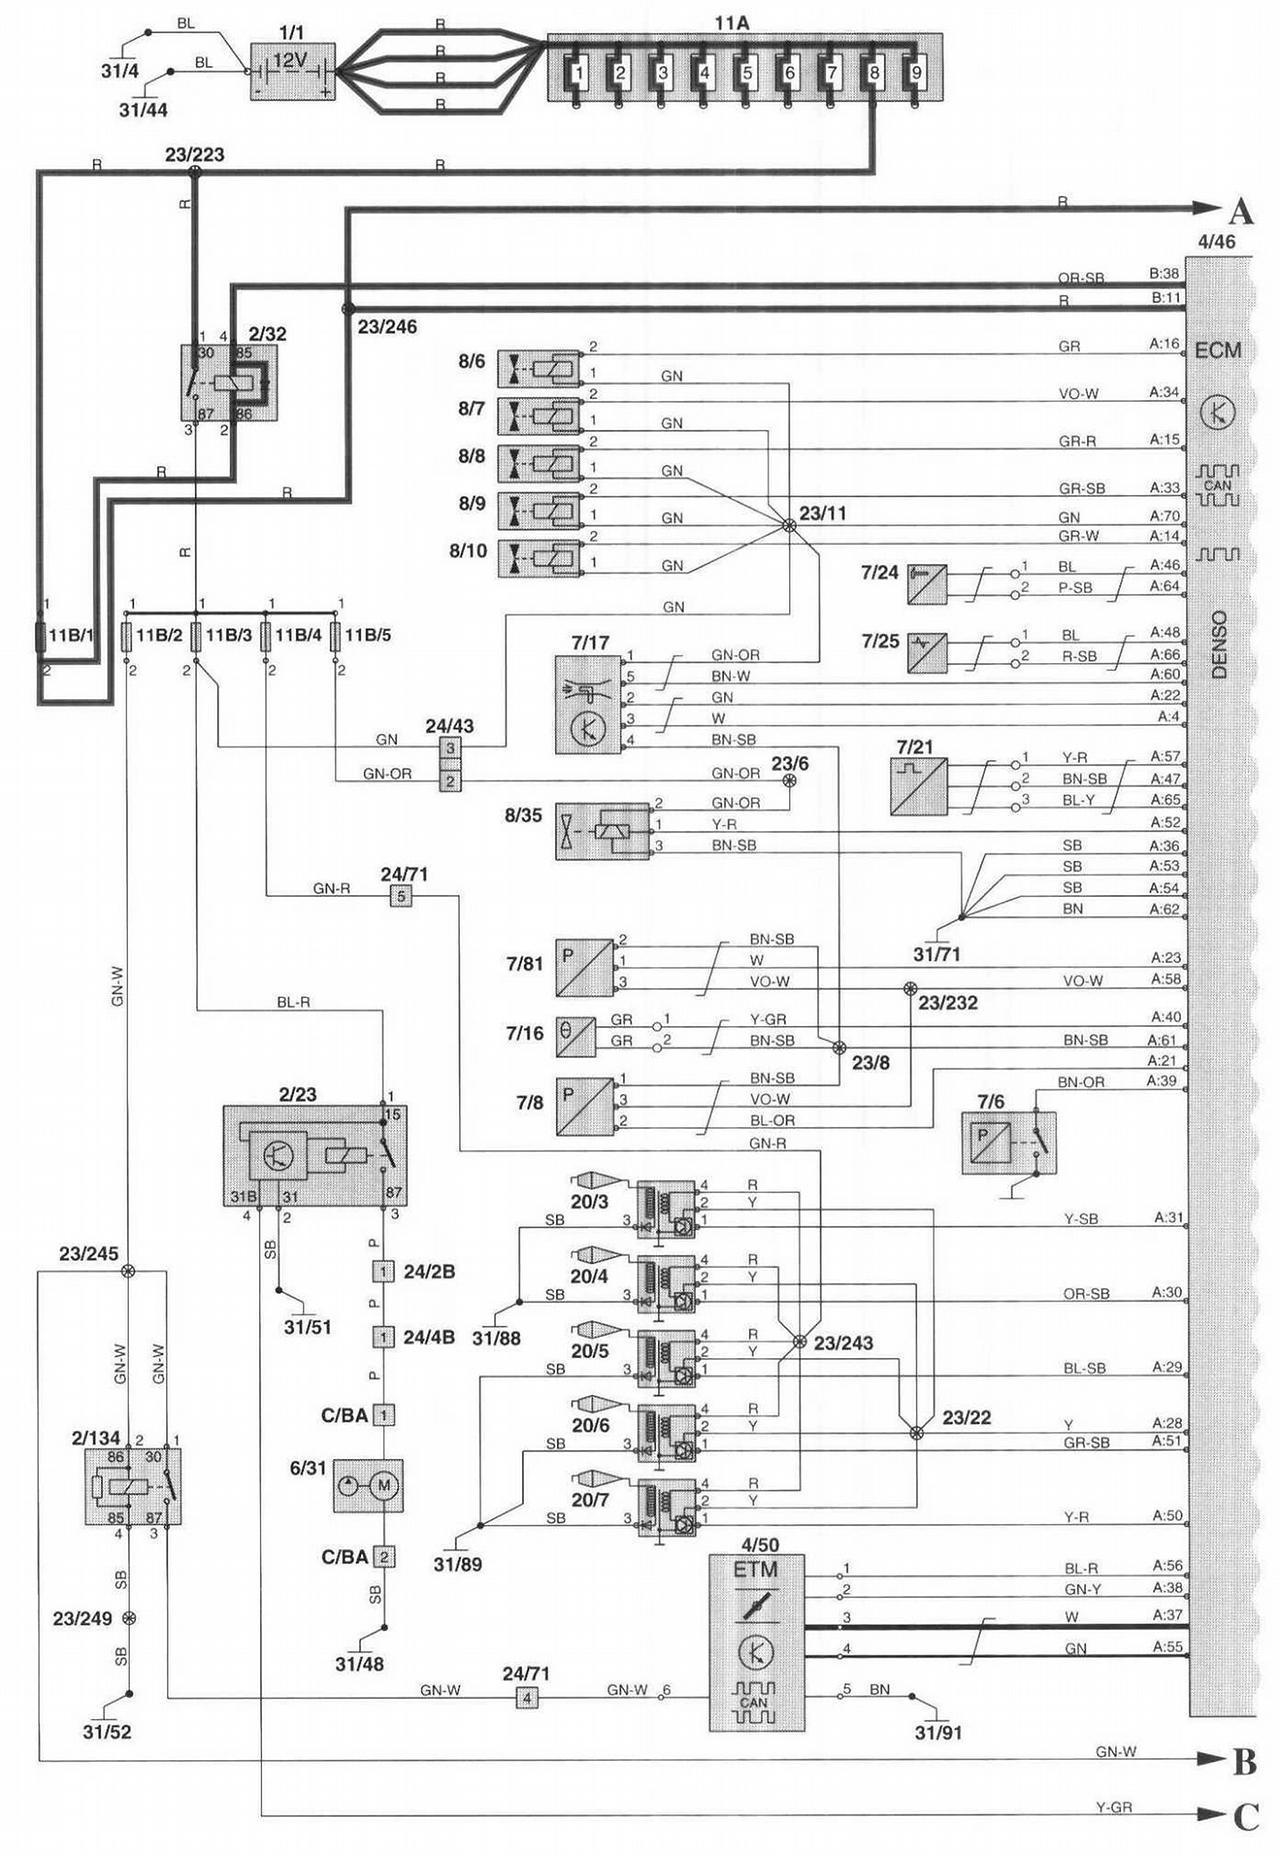 volvo s80 wiring diagram pdf volvo wiring diagrams wiring diagram data  volvo wiring diagrams wiring diagram data